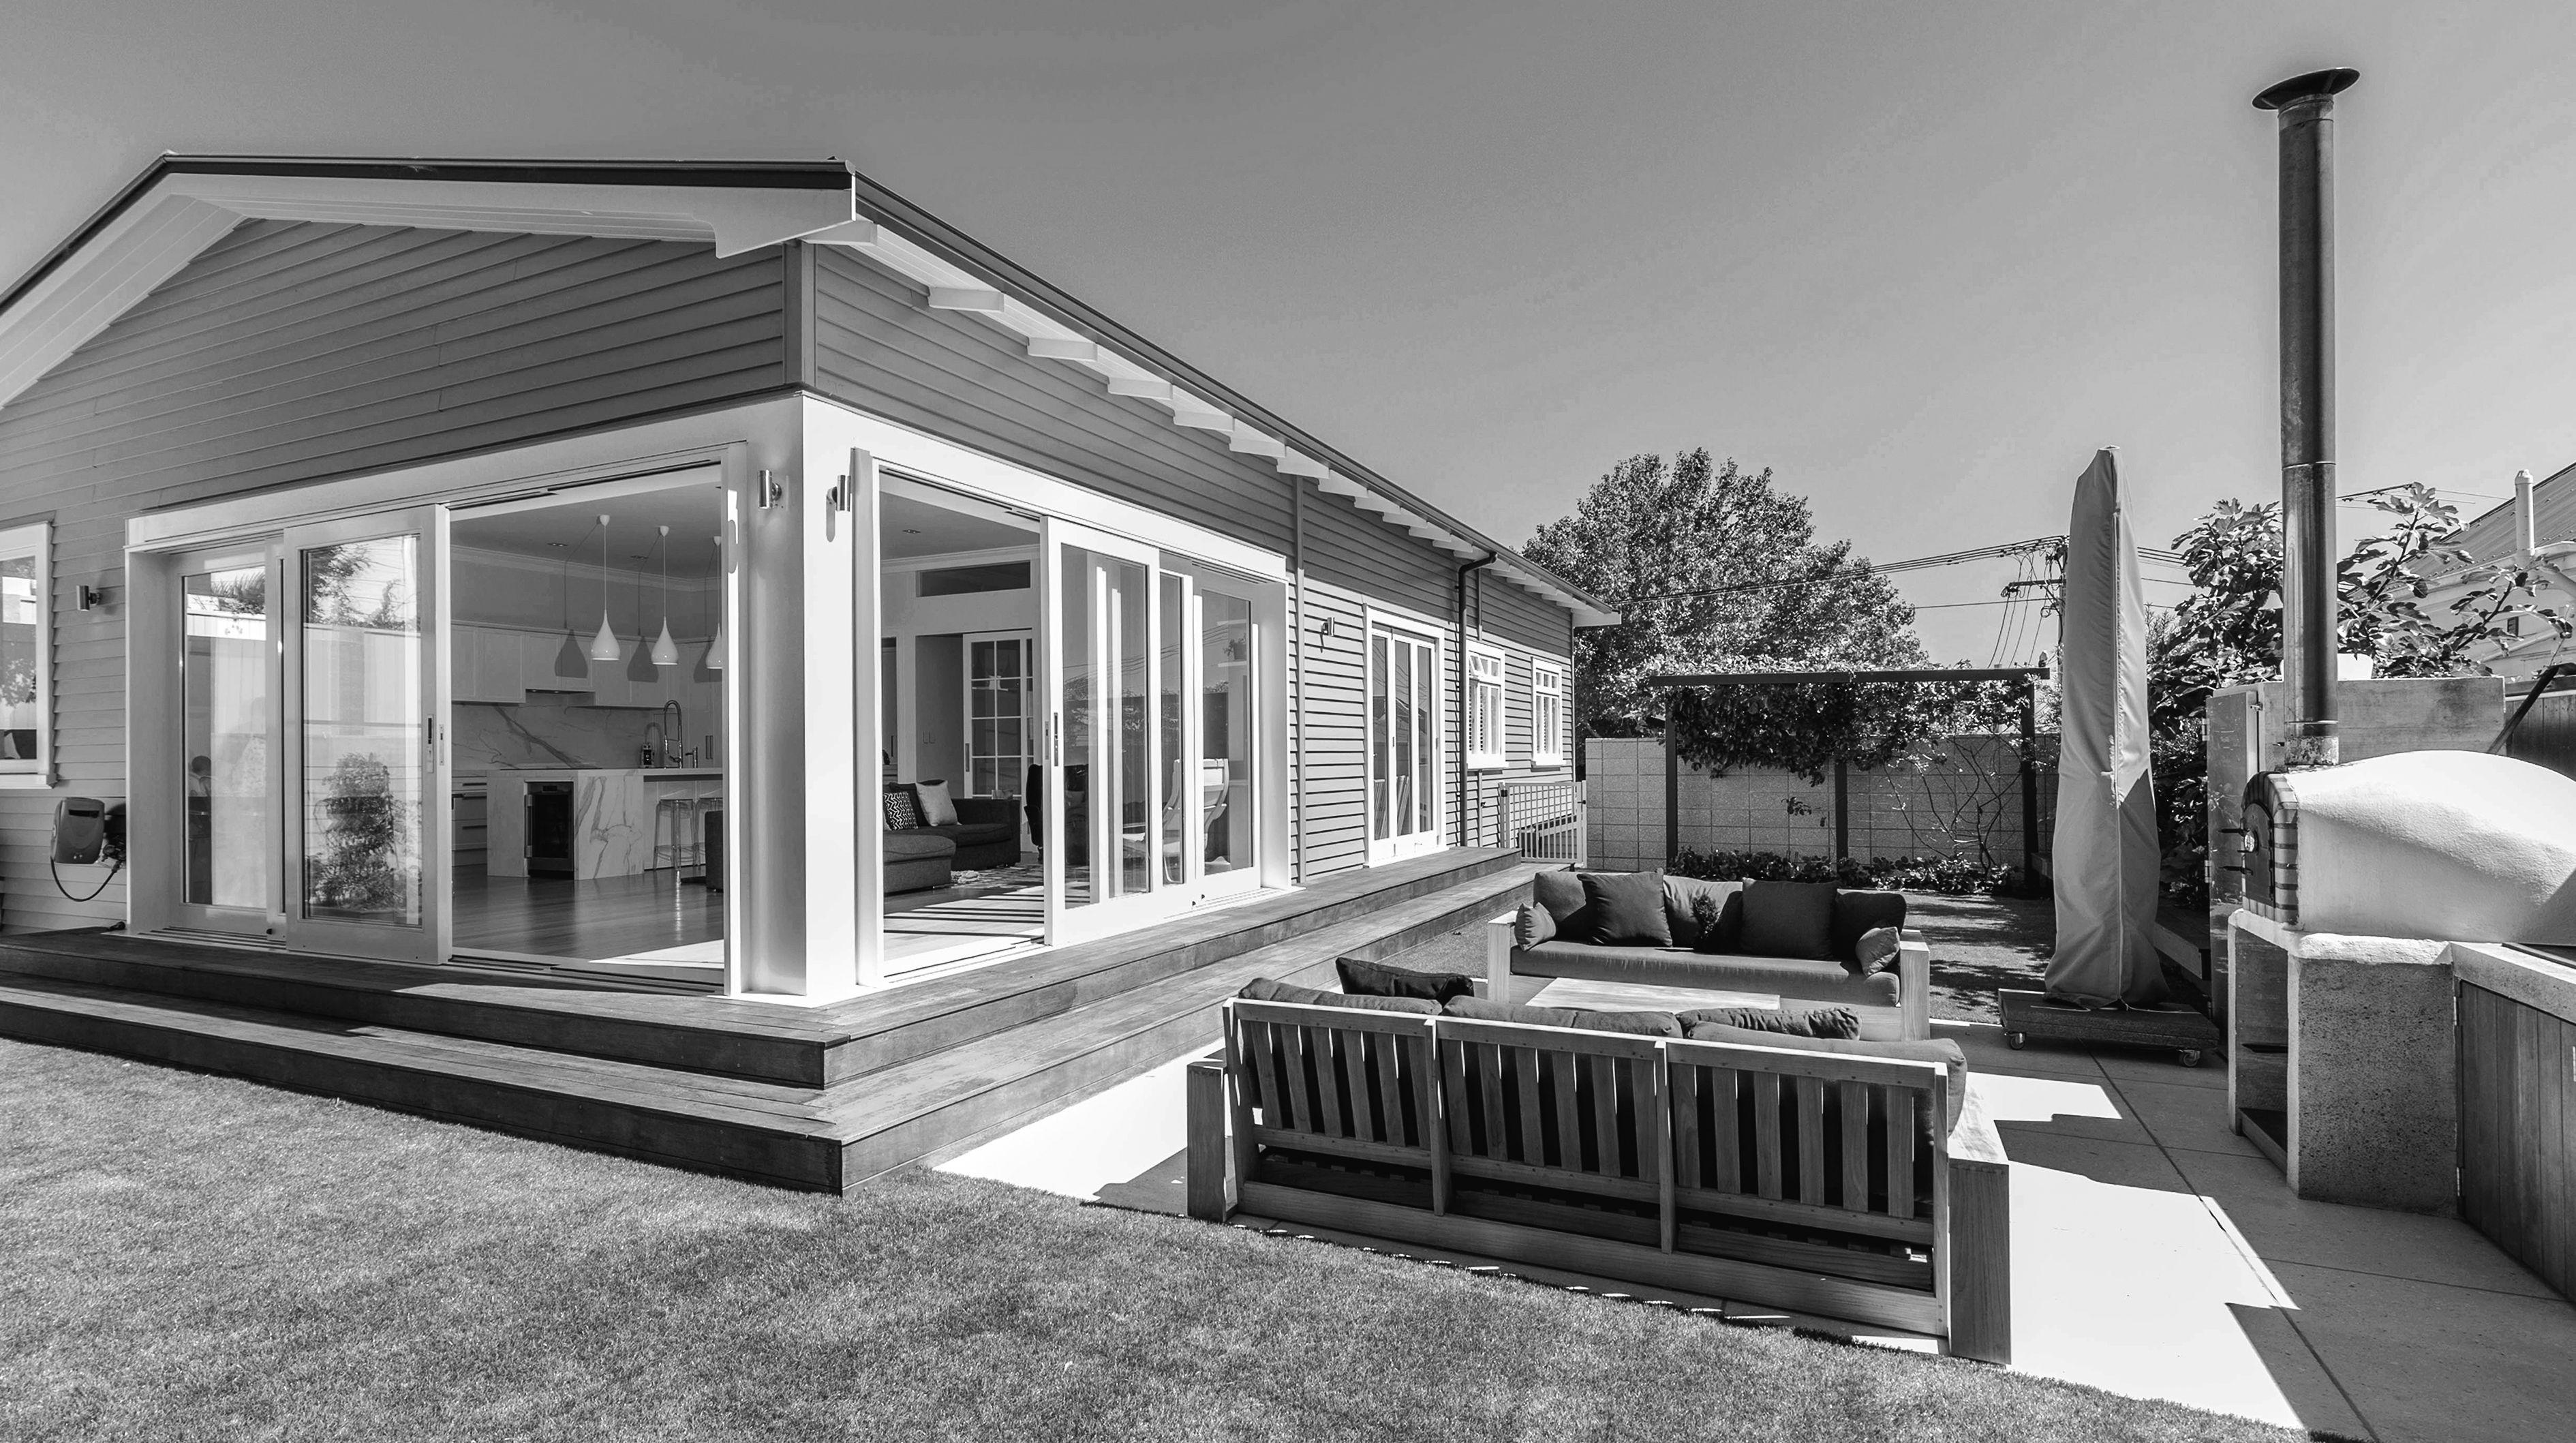 Macfie Architectural Design Architectural Drafting